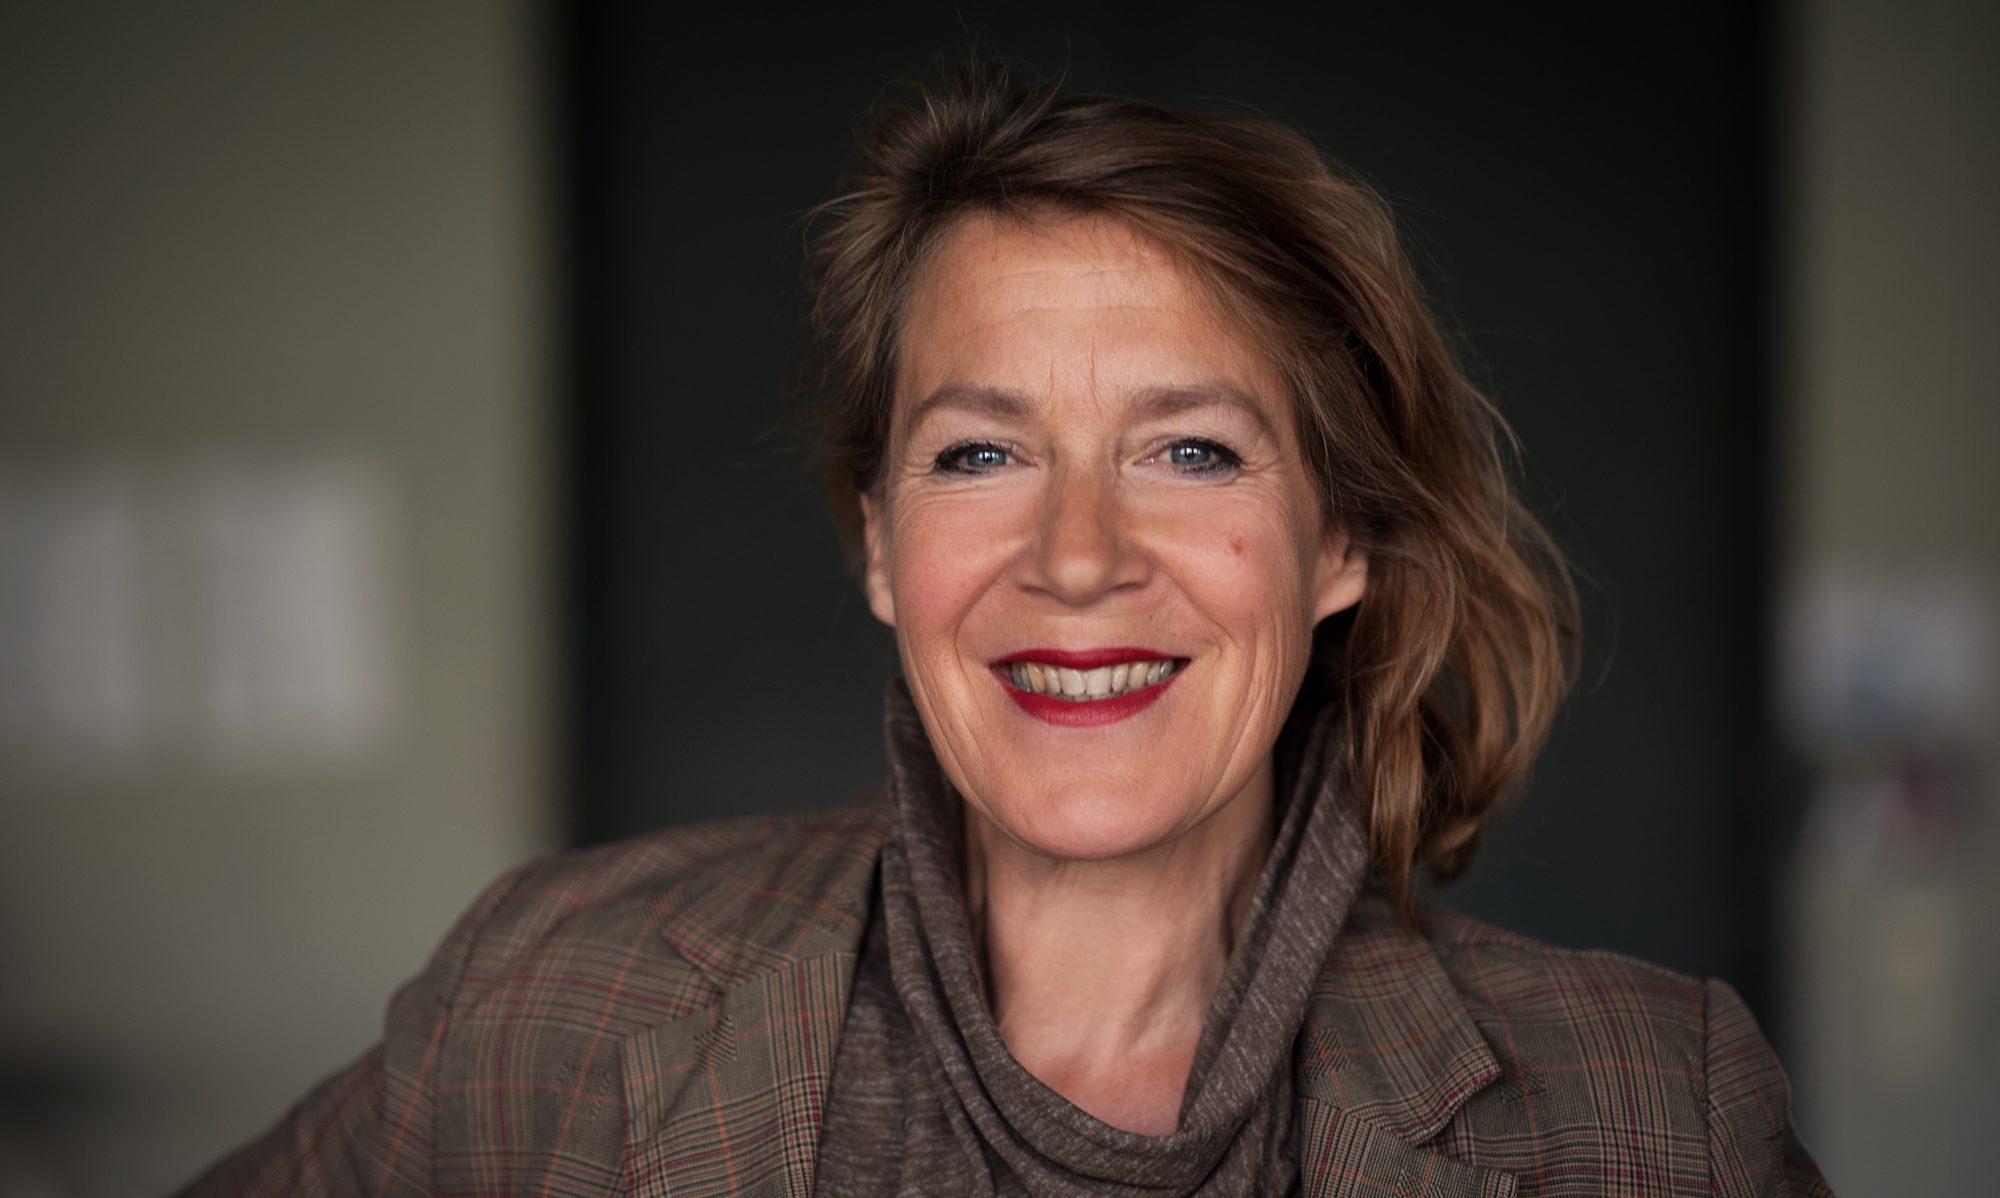 Hannelore Bähr